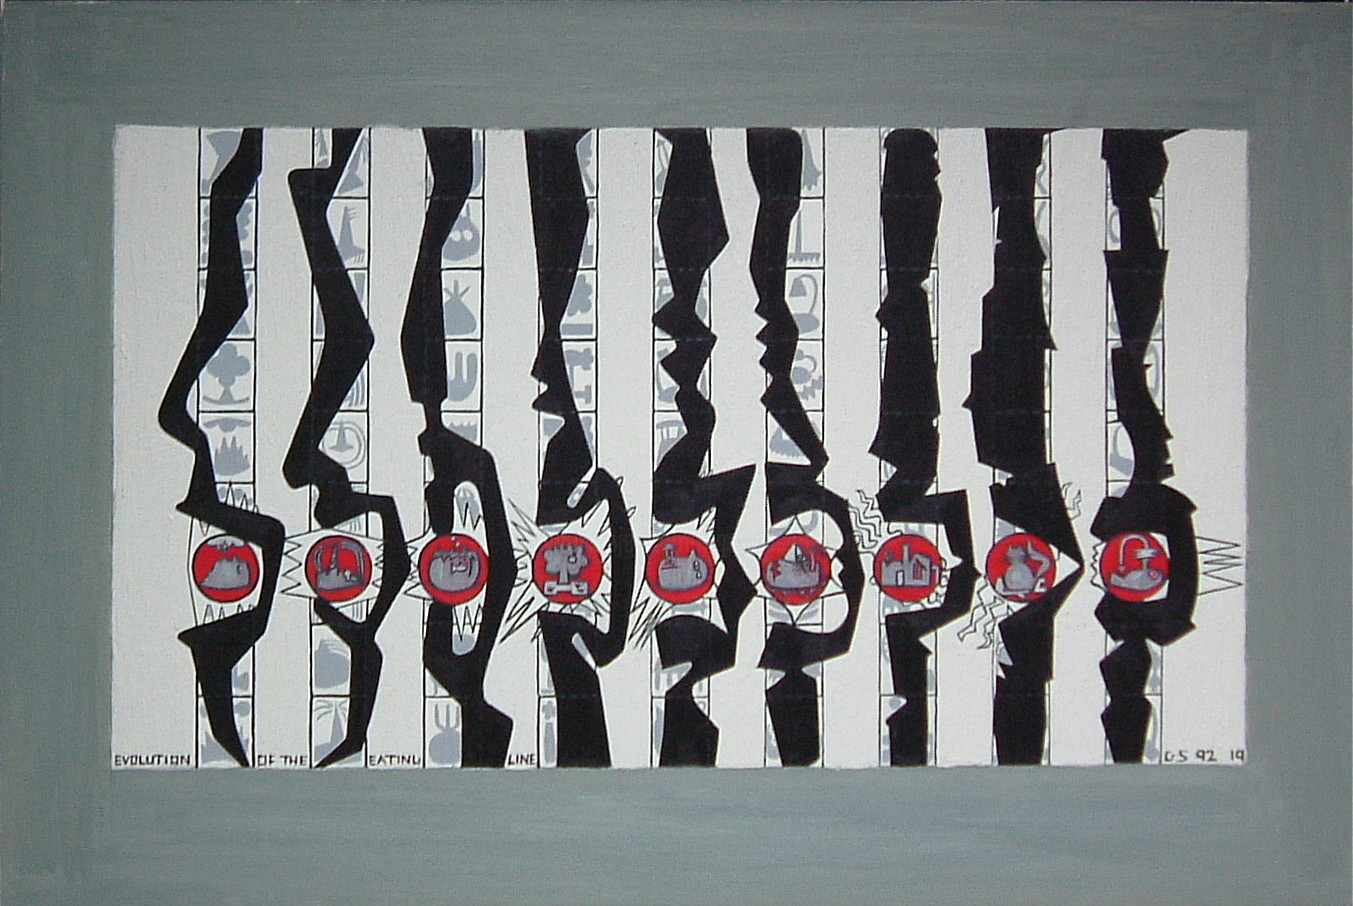 Gerald Shepherd - Evolution Of The Eating Line